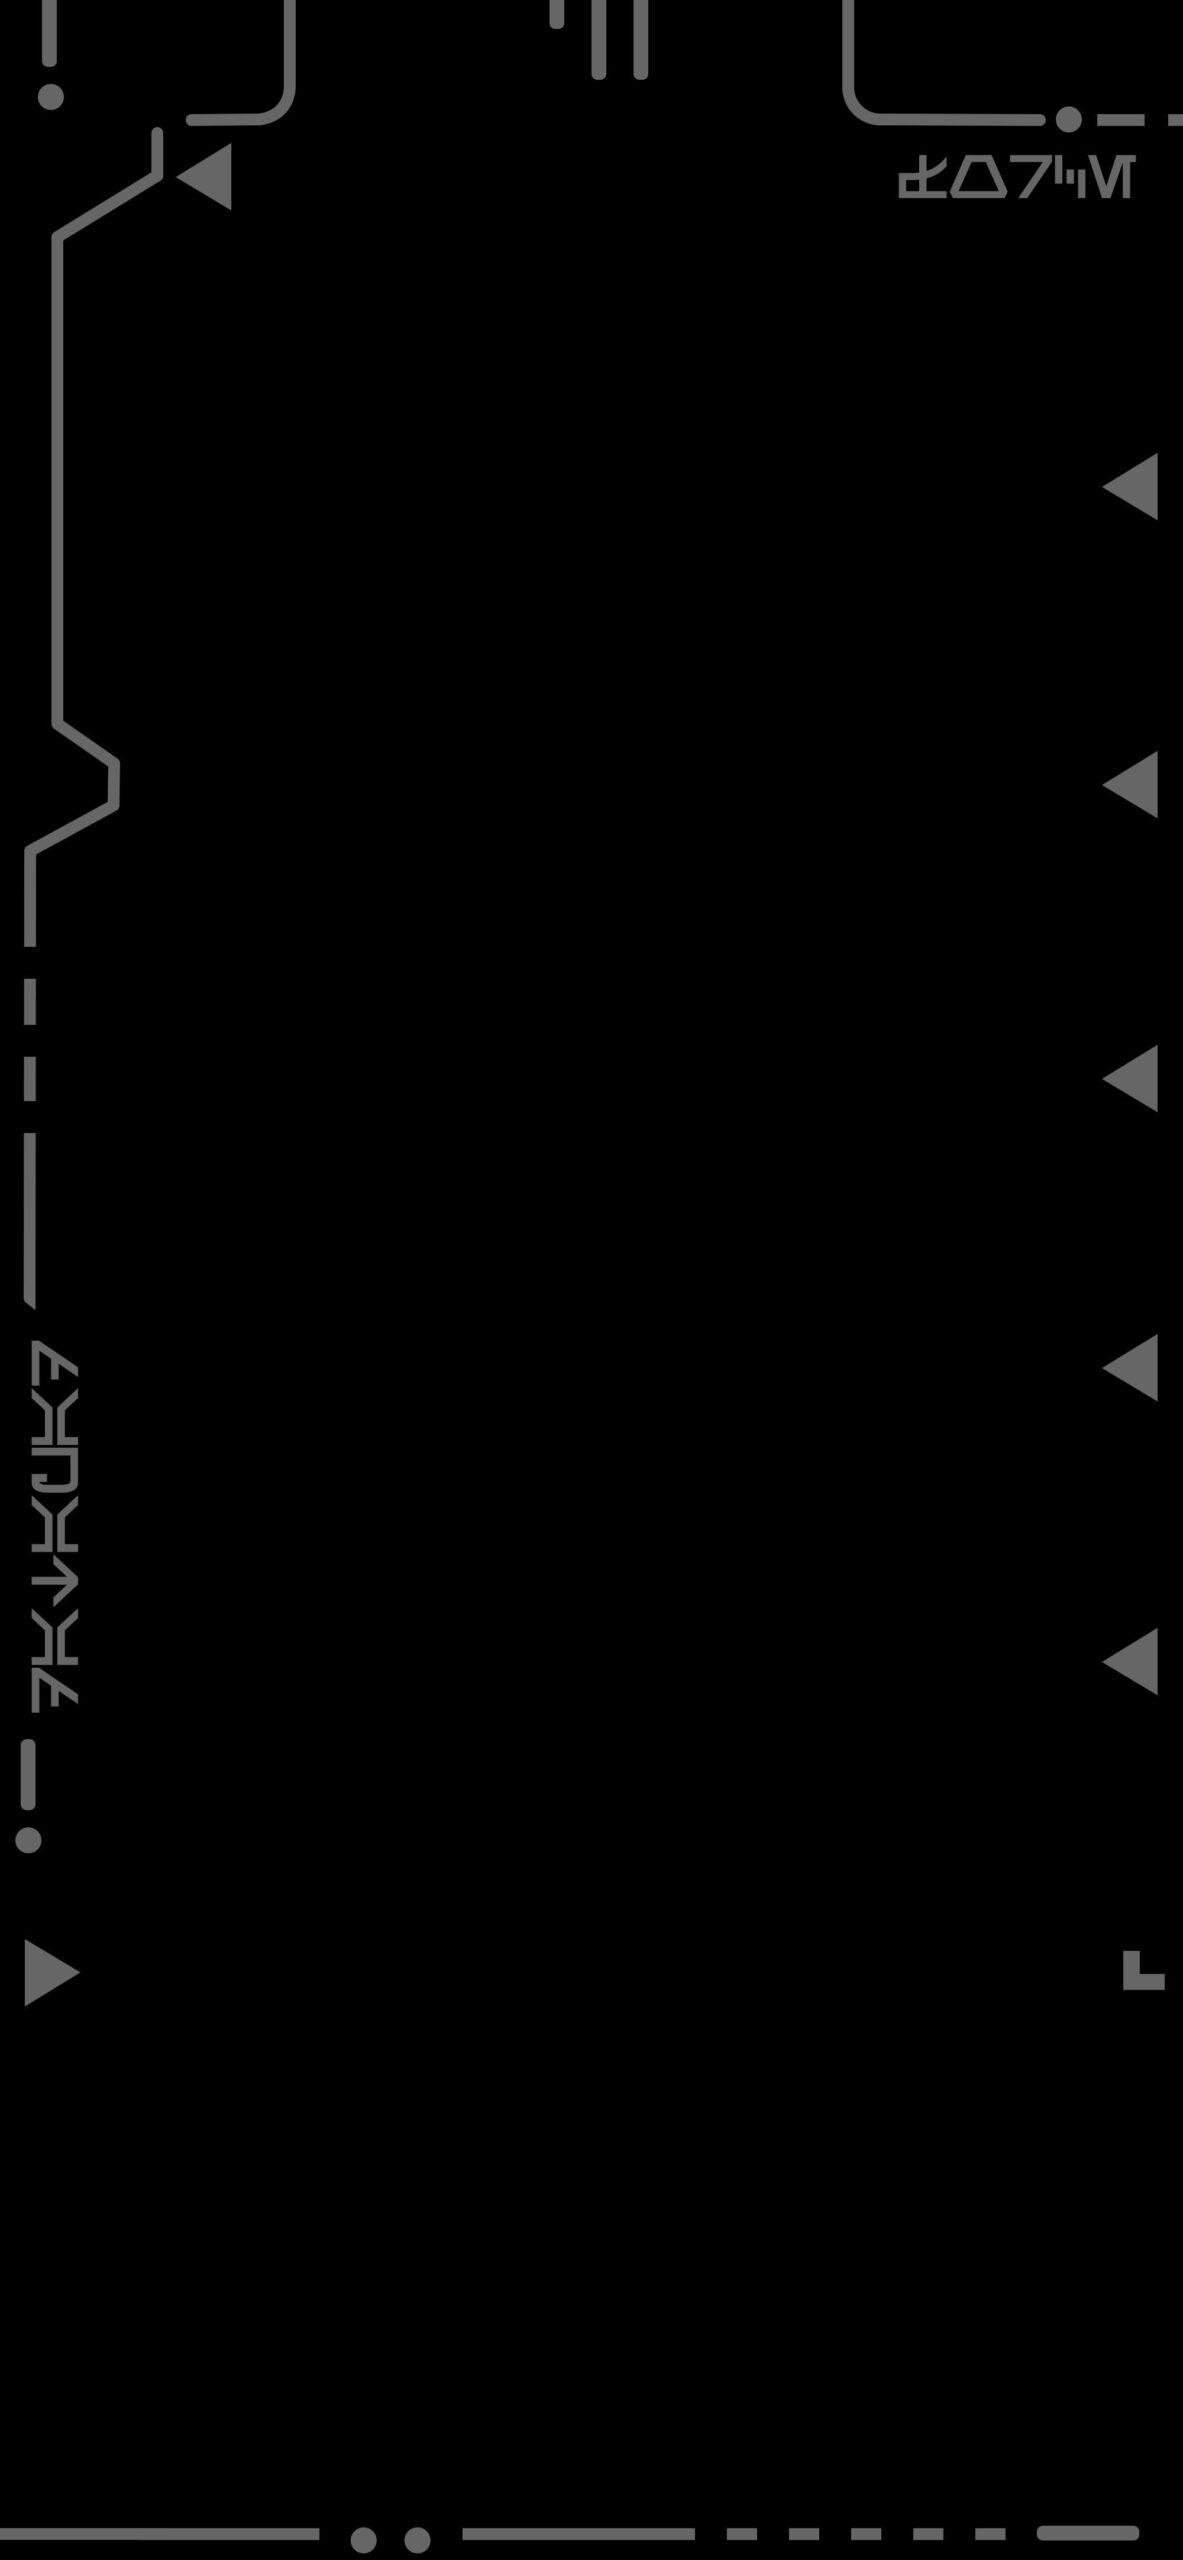 star wars datapad black background 2